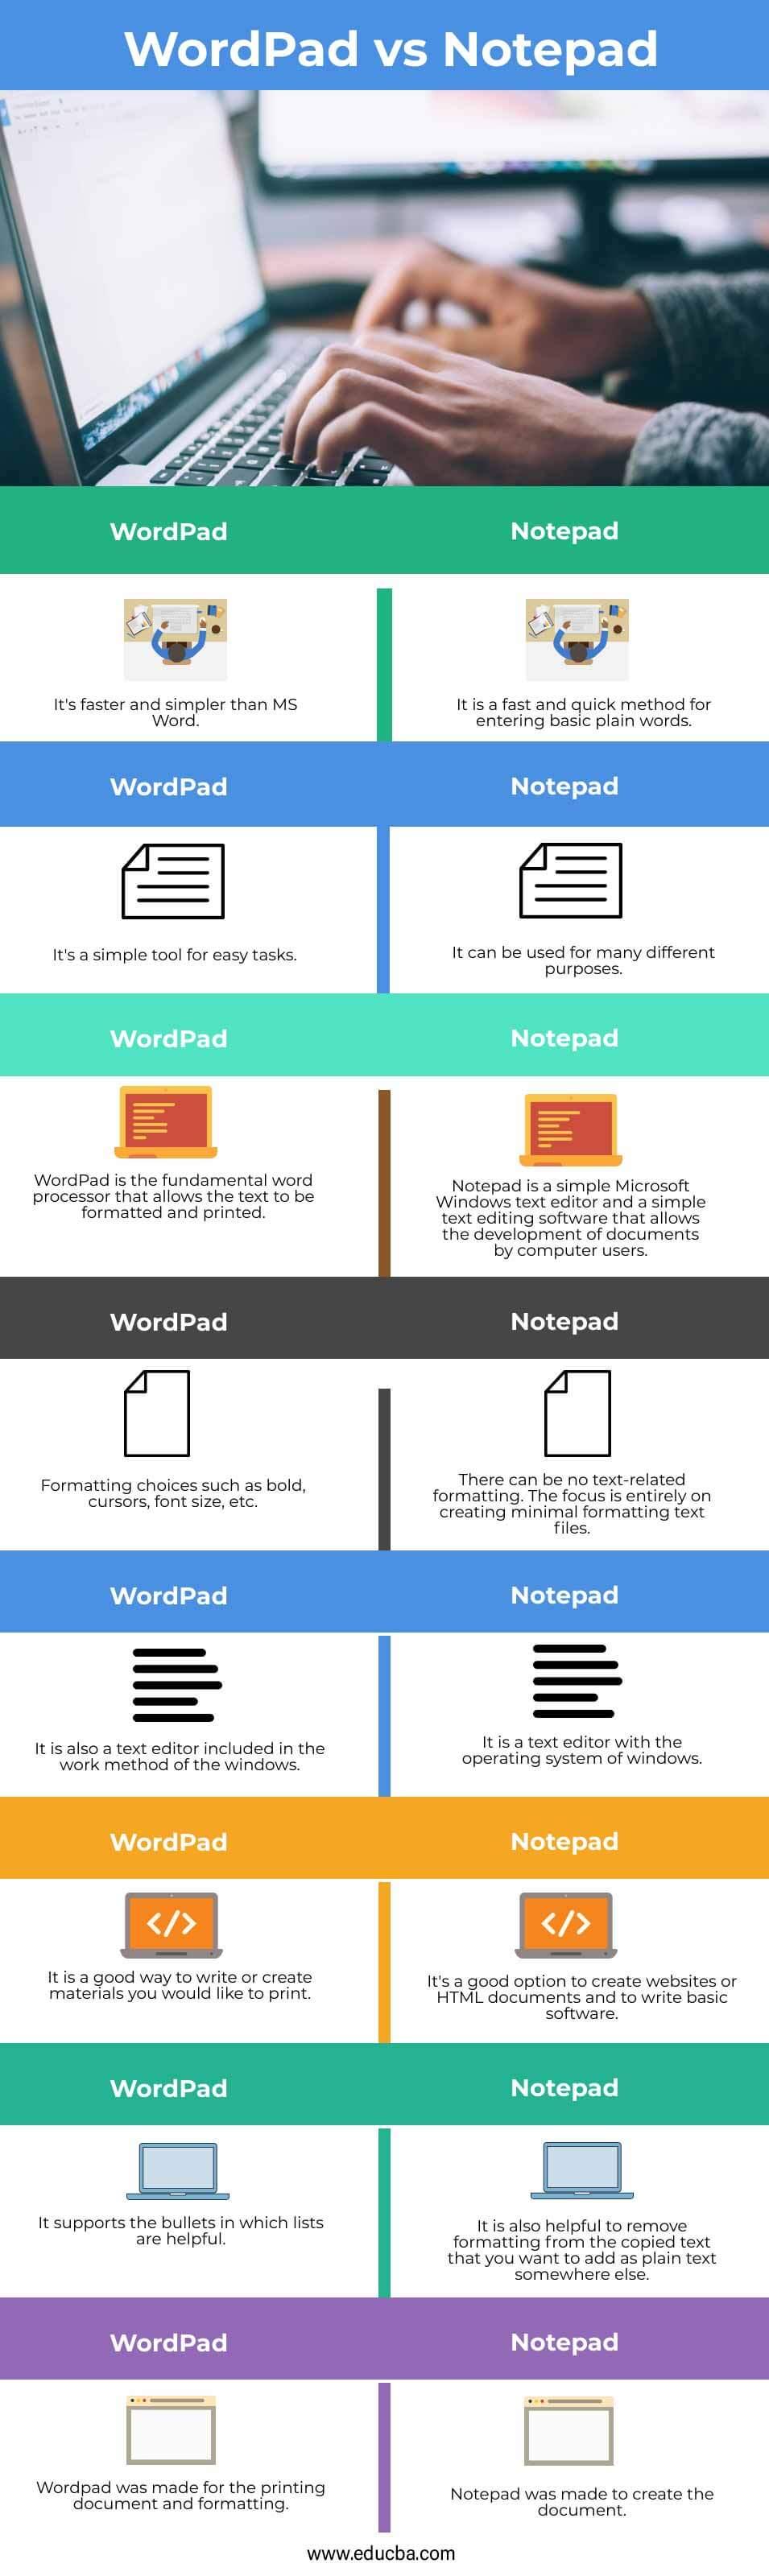 WordPad-vs-Notepad-info